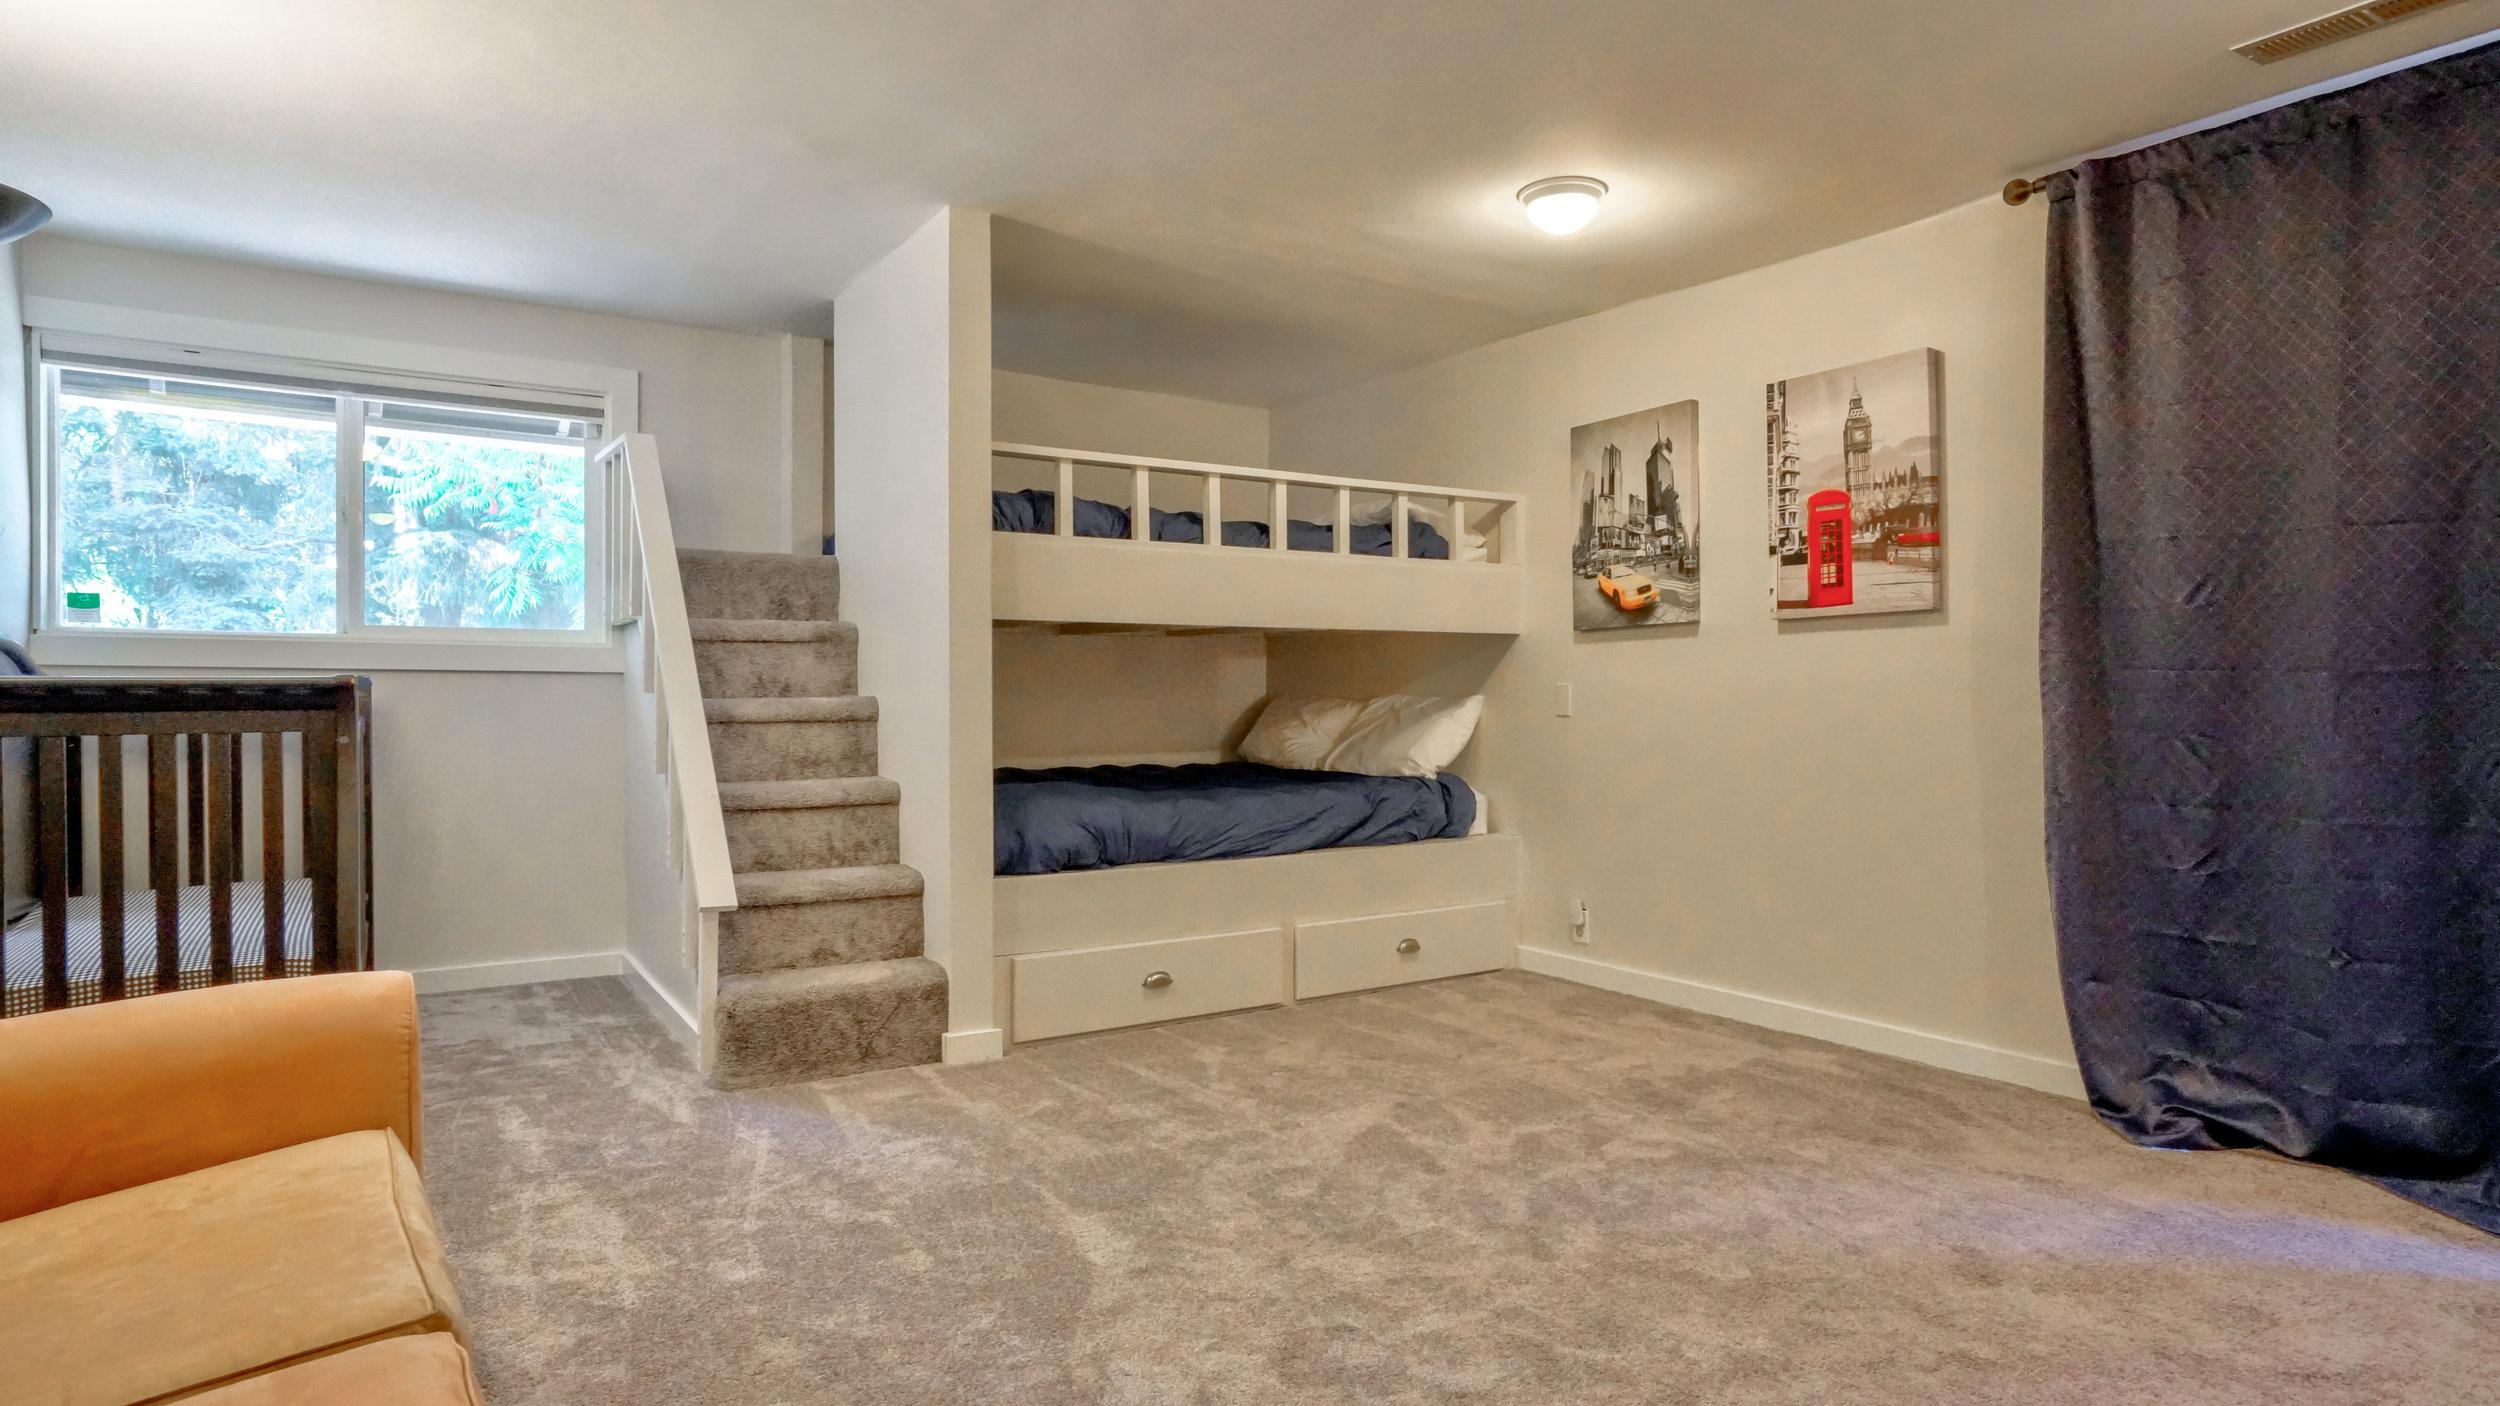 best-airbnb-portland-for-groups-playroom.jpg